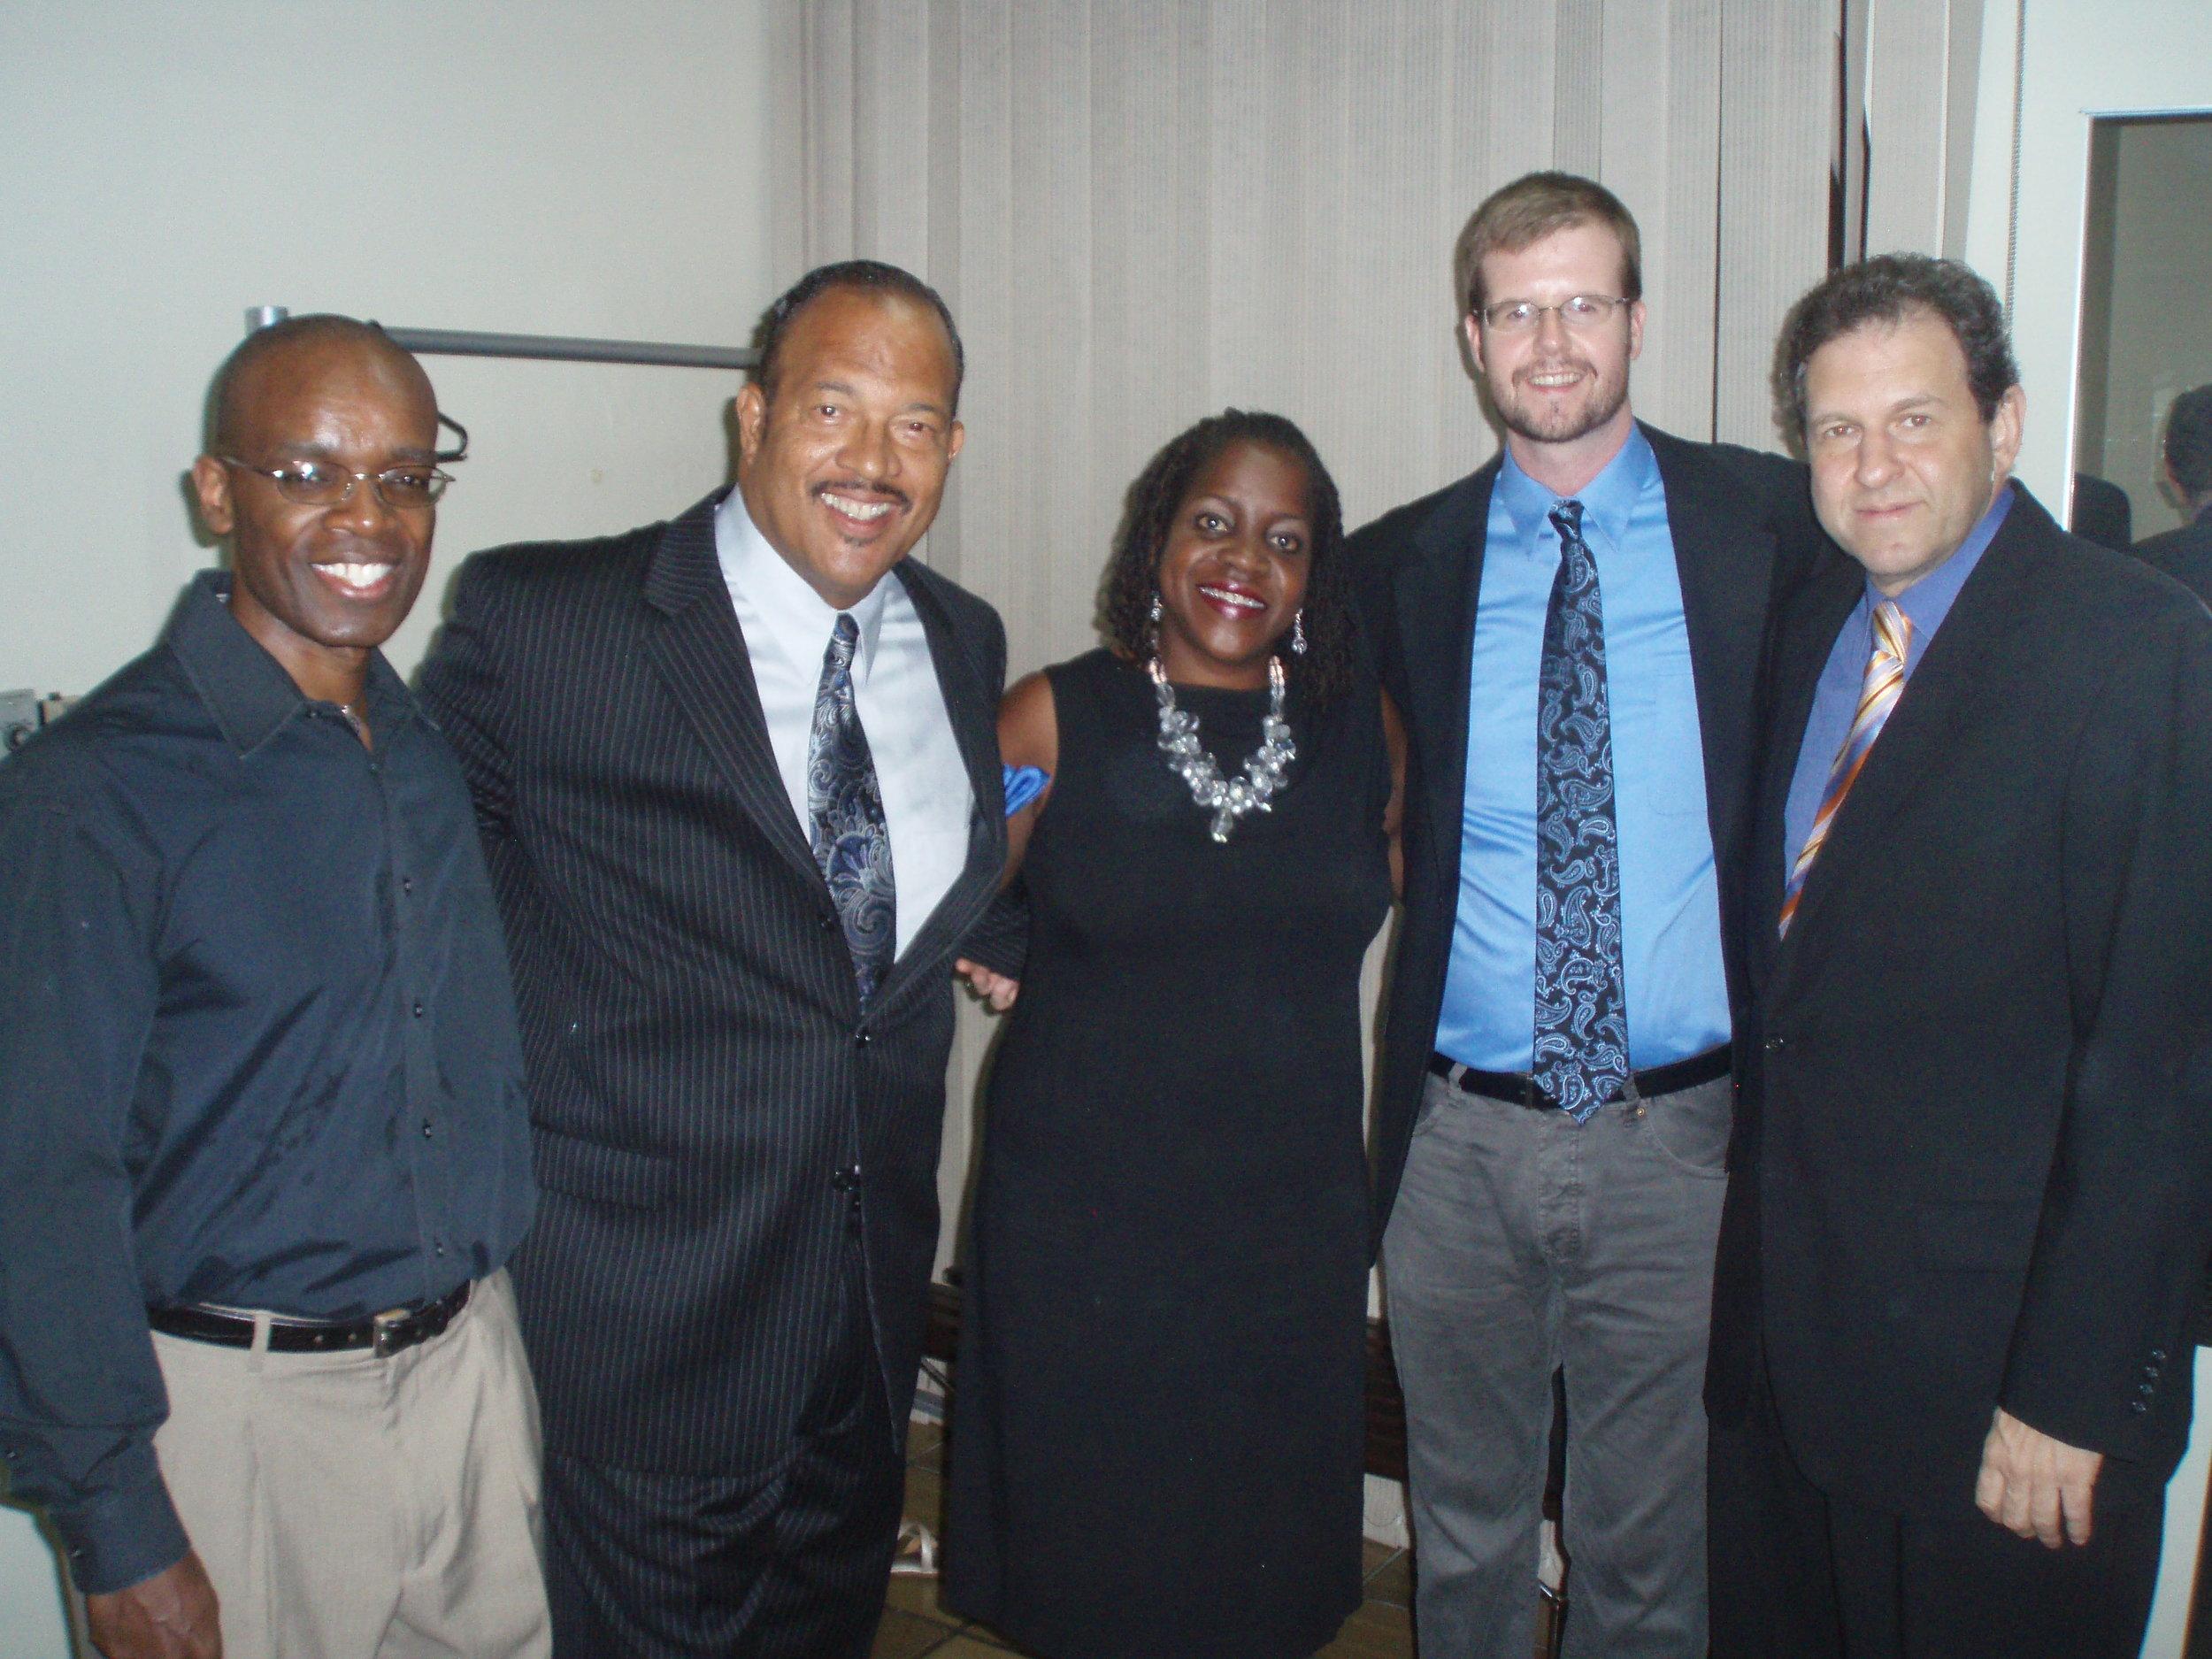 w/ Rudy Royston, Steve Kroon, Willie Harvey & Bruce Barth